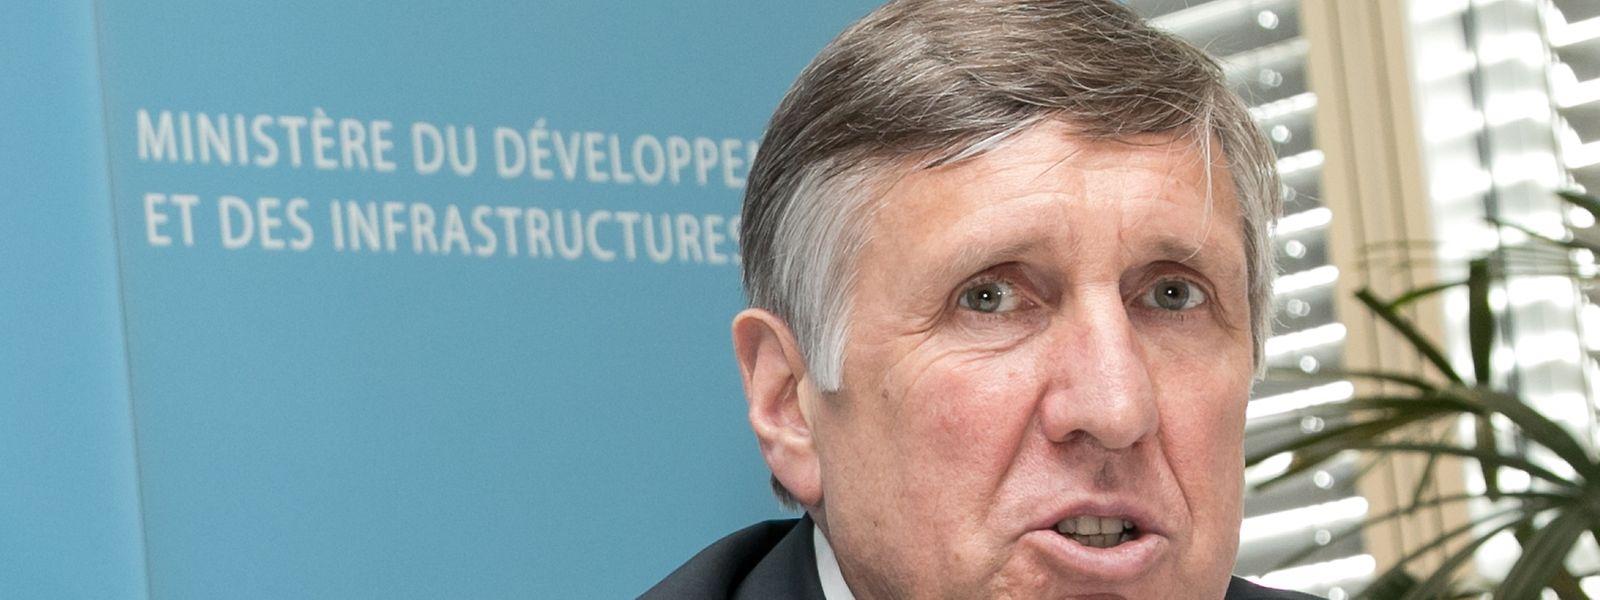 Minister François Bausch: neues Programme directeur der Landesplanung bis 2019.